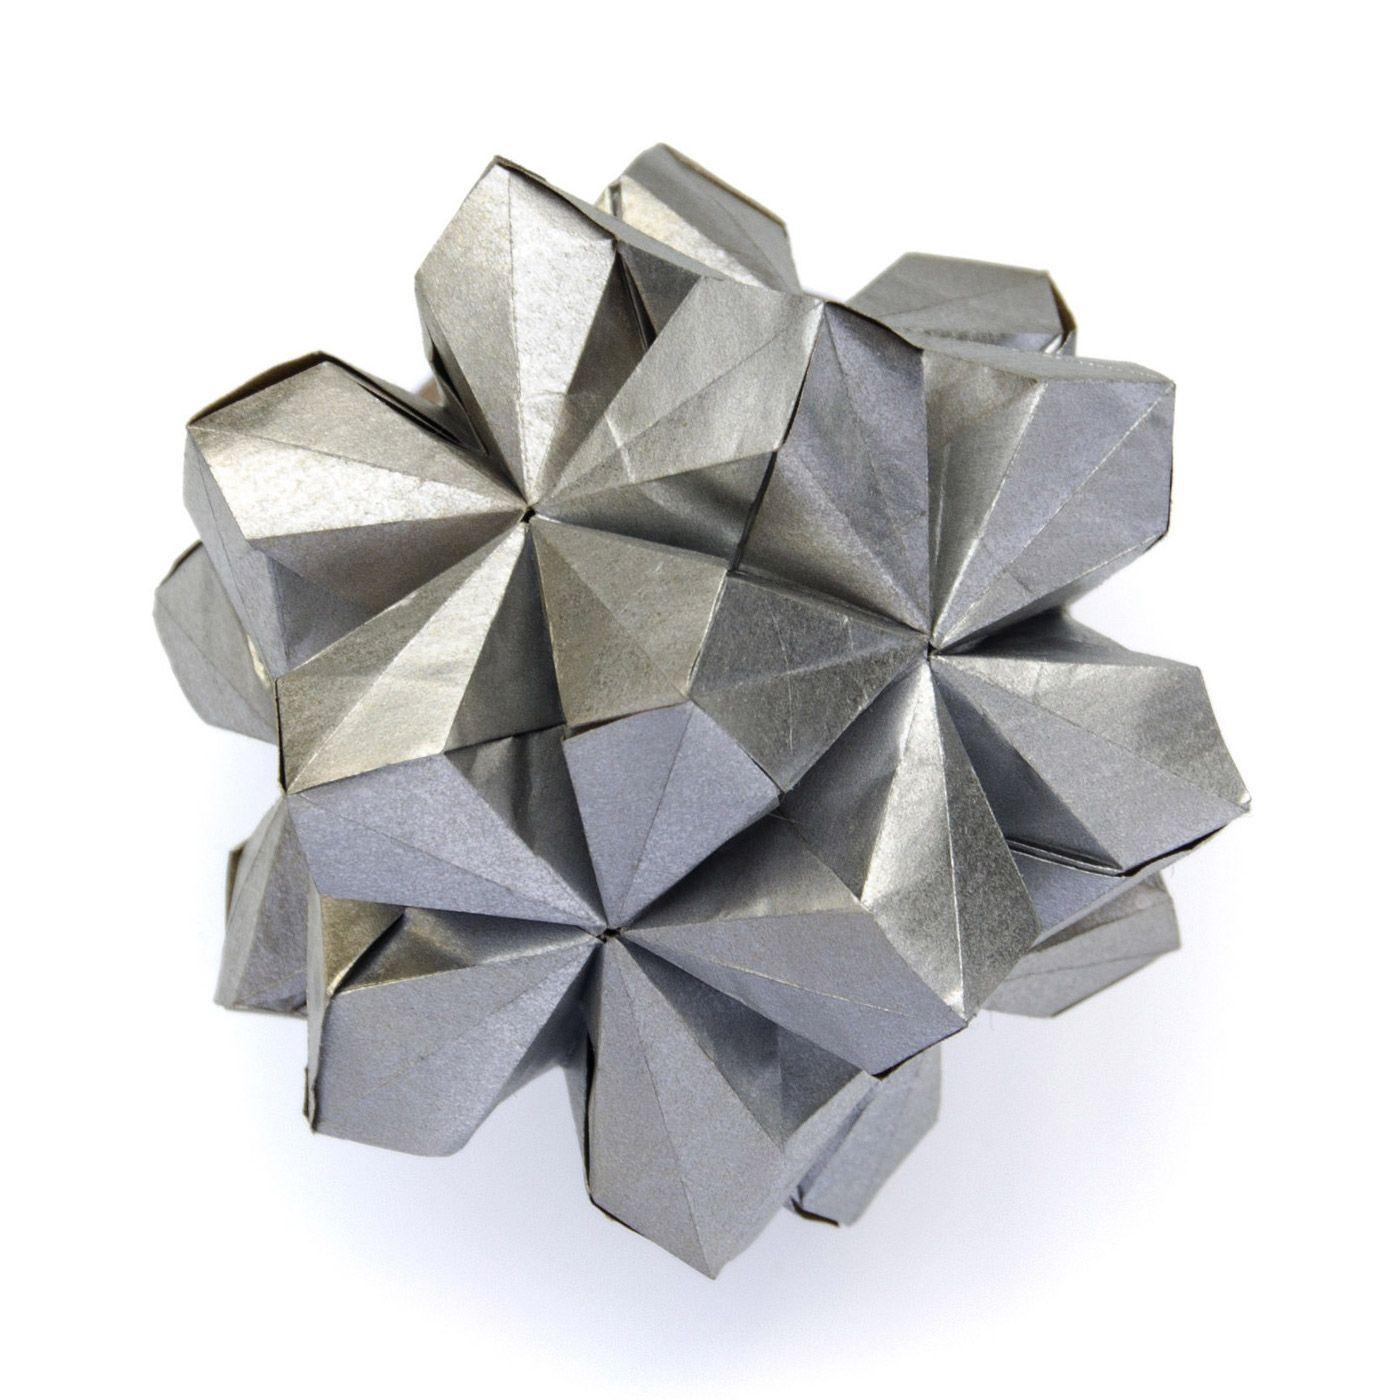 Amazing Origami Artworks by Ekaterina Lukasheva – Inspiration Grid   Design Inspiration #art #artwork #origami #paperart #paper #papercraft #inspirationgrid